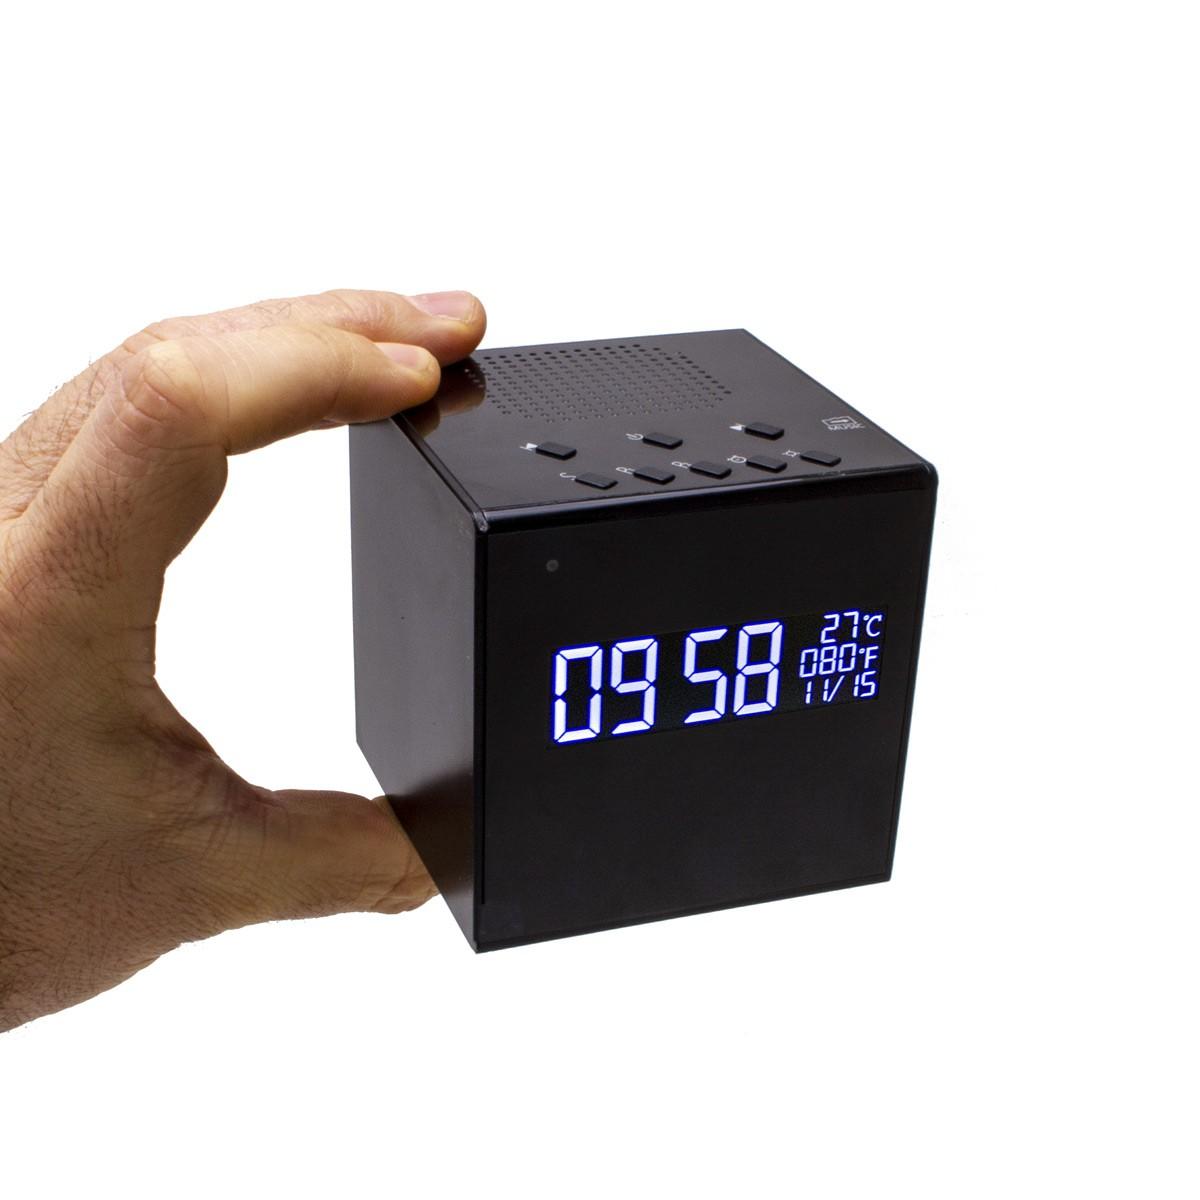 Horloge réveil alarme enceinte bluetooth micro caméra IP Wi-Fi HD avec vision nocturne